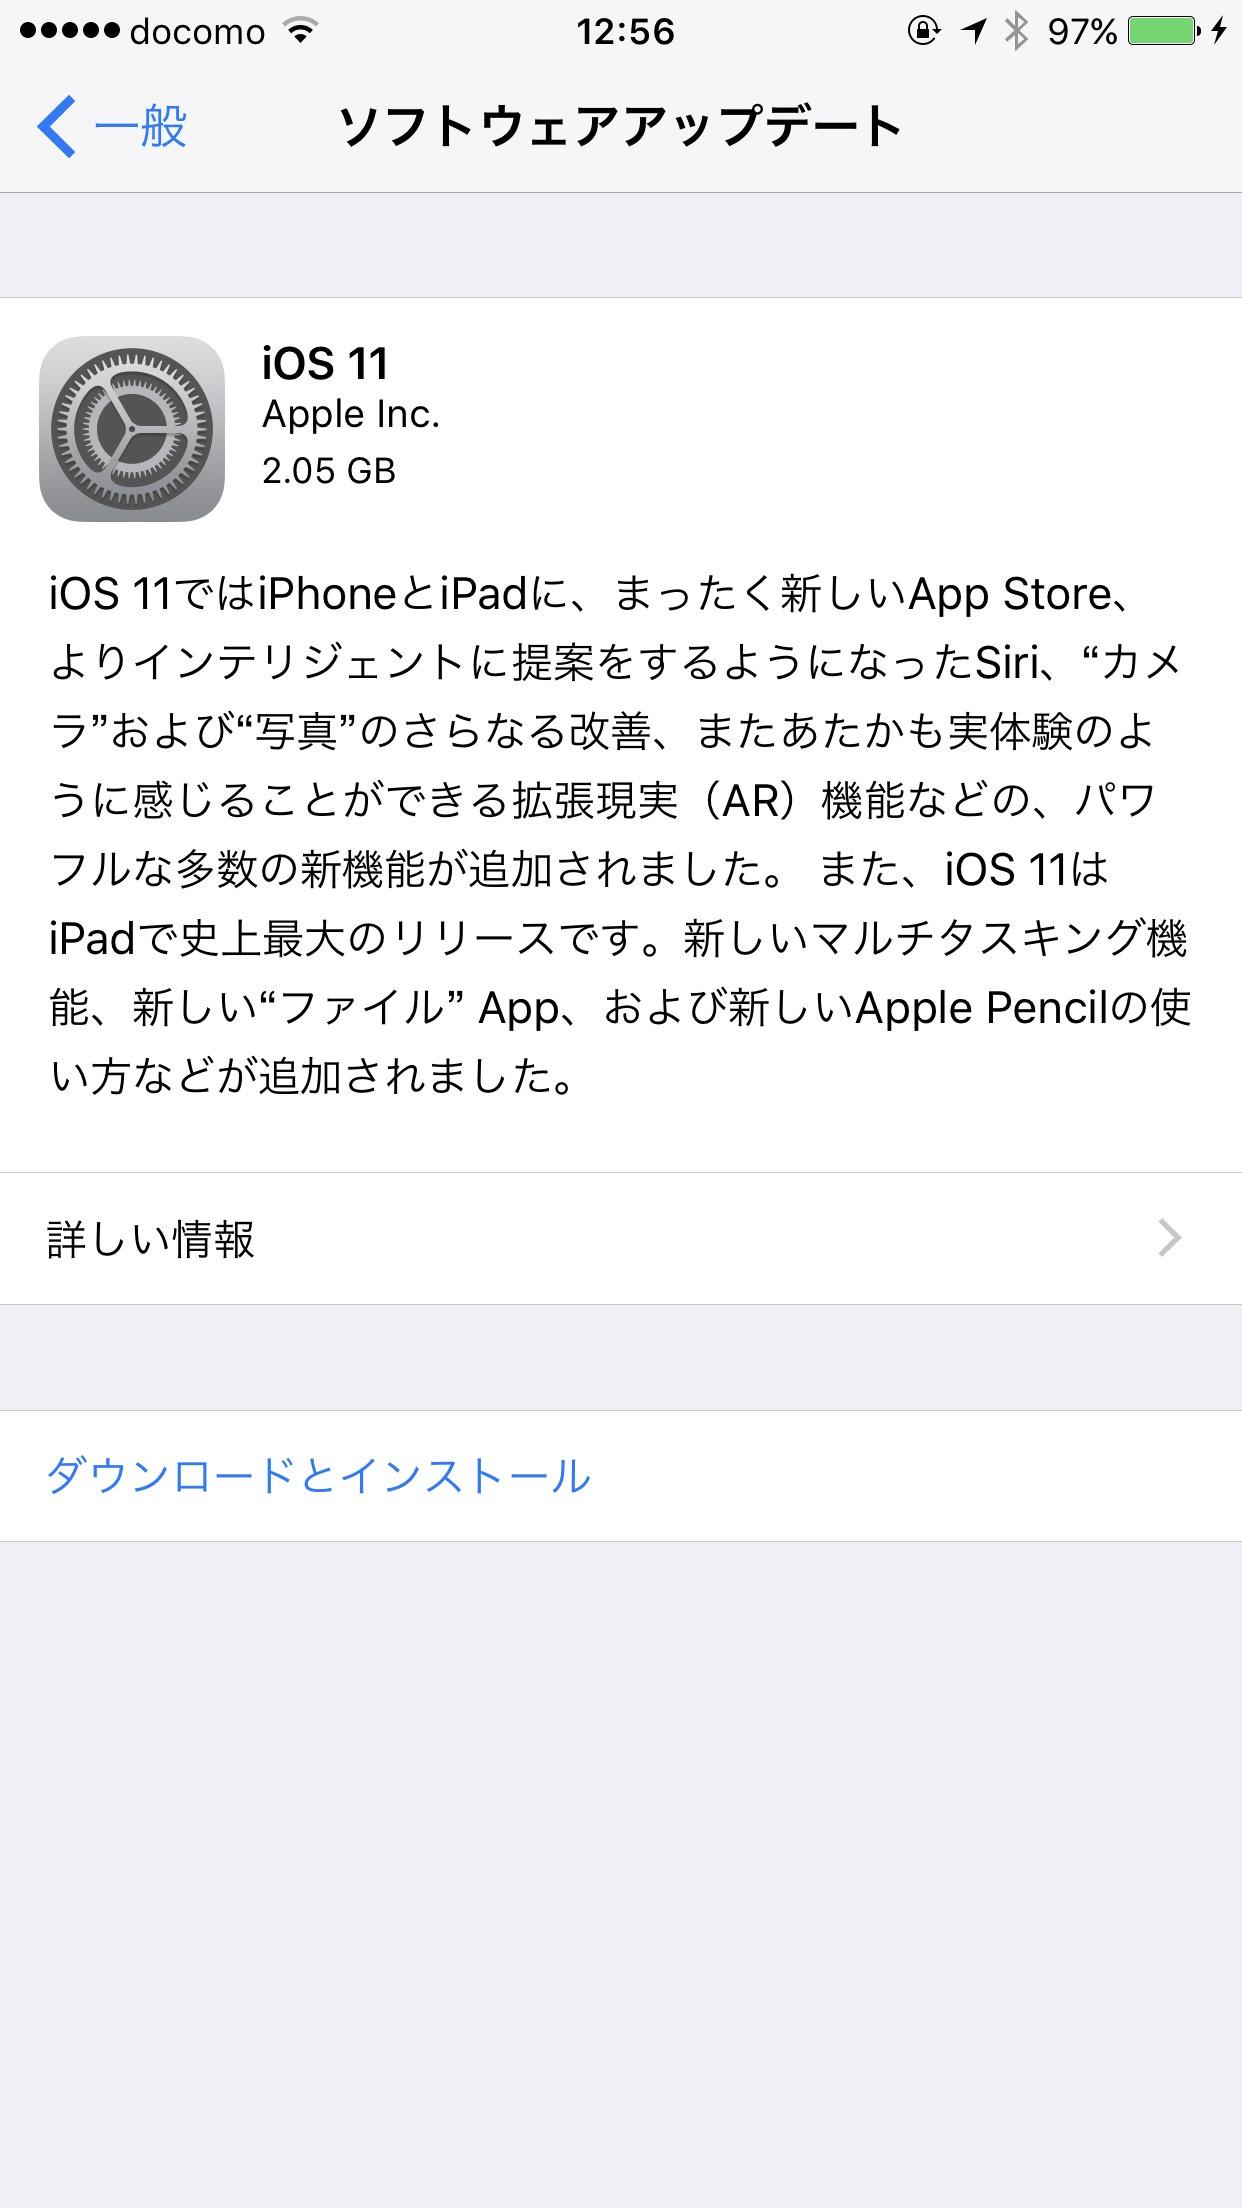 「iOS 11 ソフトウェアアップデート」リリース